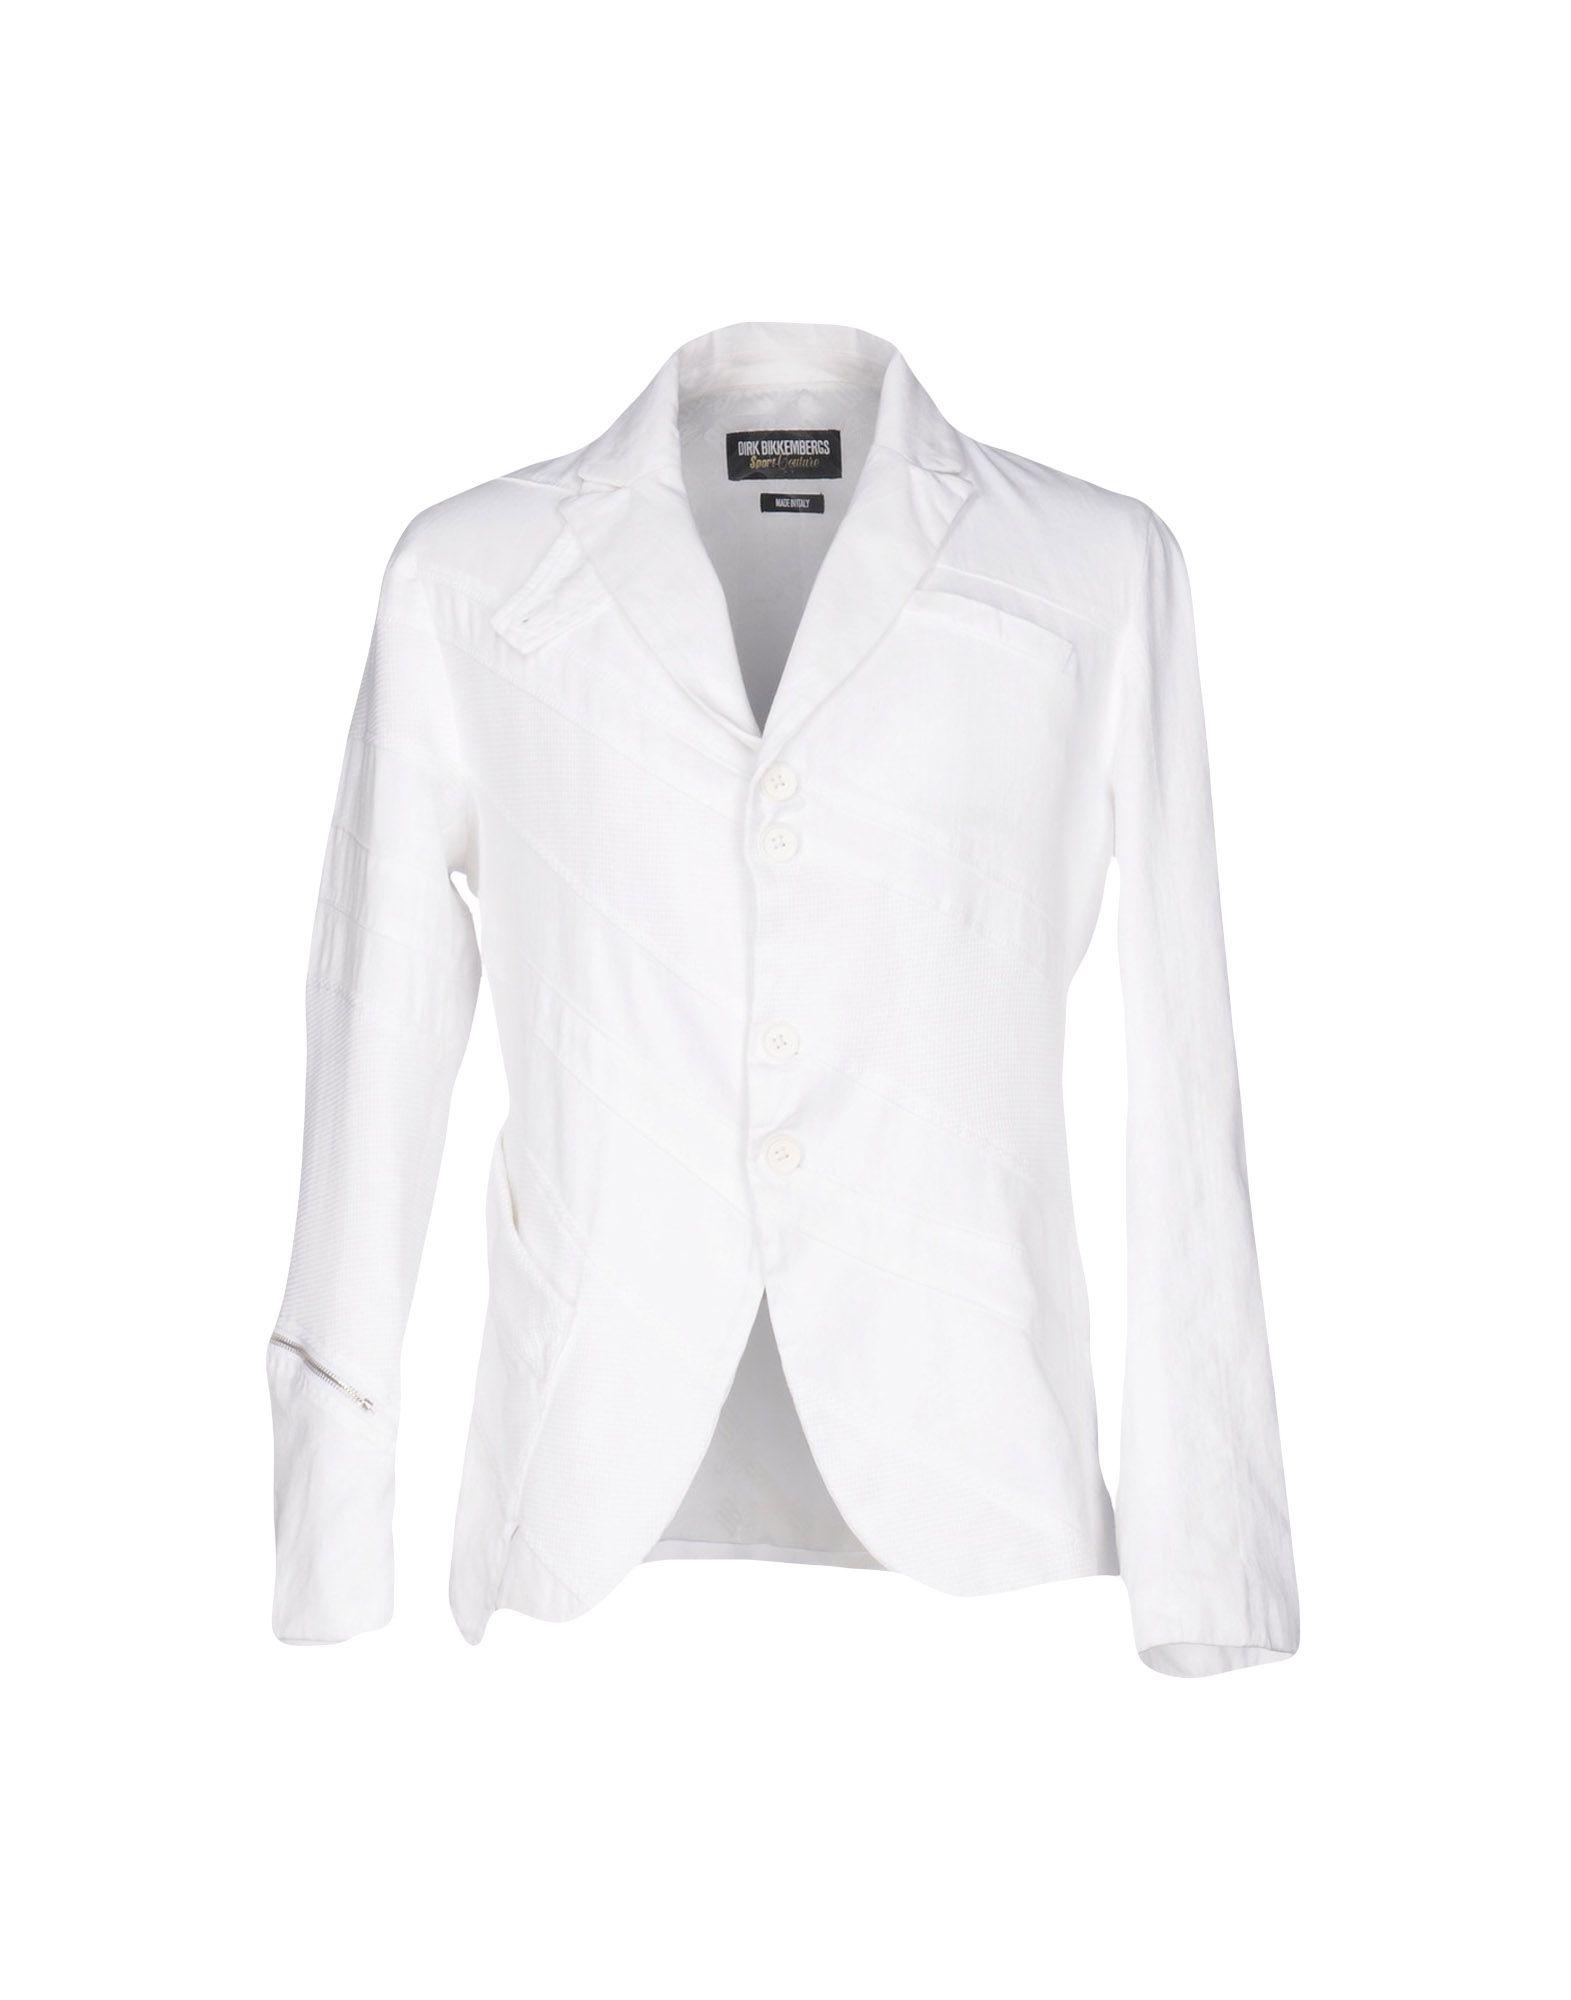 DIRK BIKKEMBERGS SPORT COUTURE Пиджак dirk bikkembergs sport couture пиджак